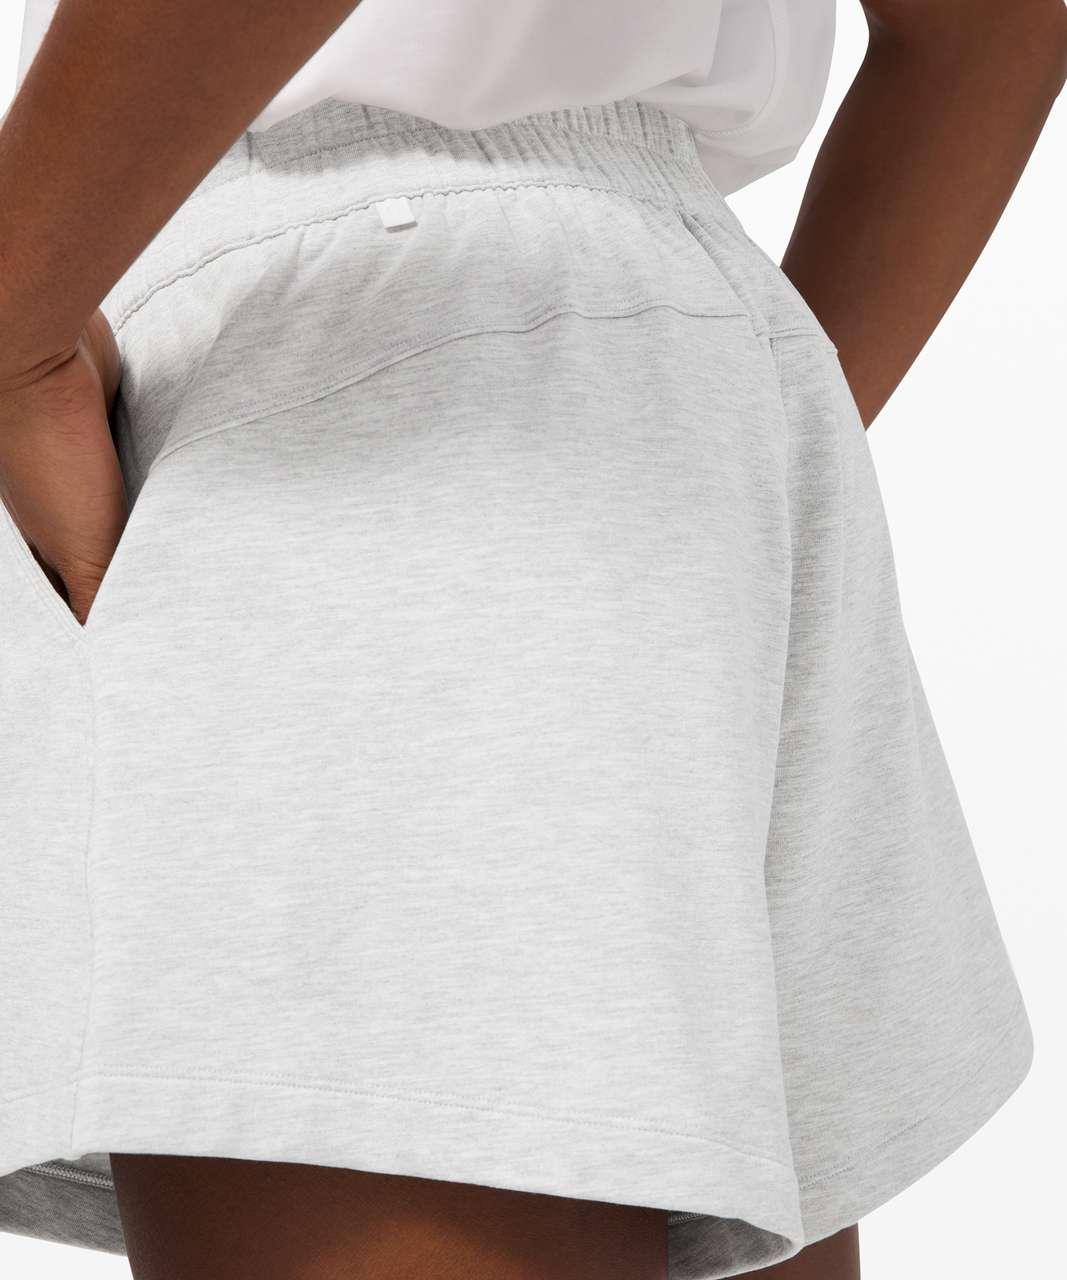 "Lululemon Mellow In High-Rise Short 4.5"" - Heathered Core Ultra Light Grey"